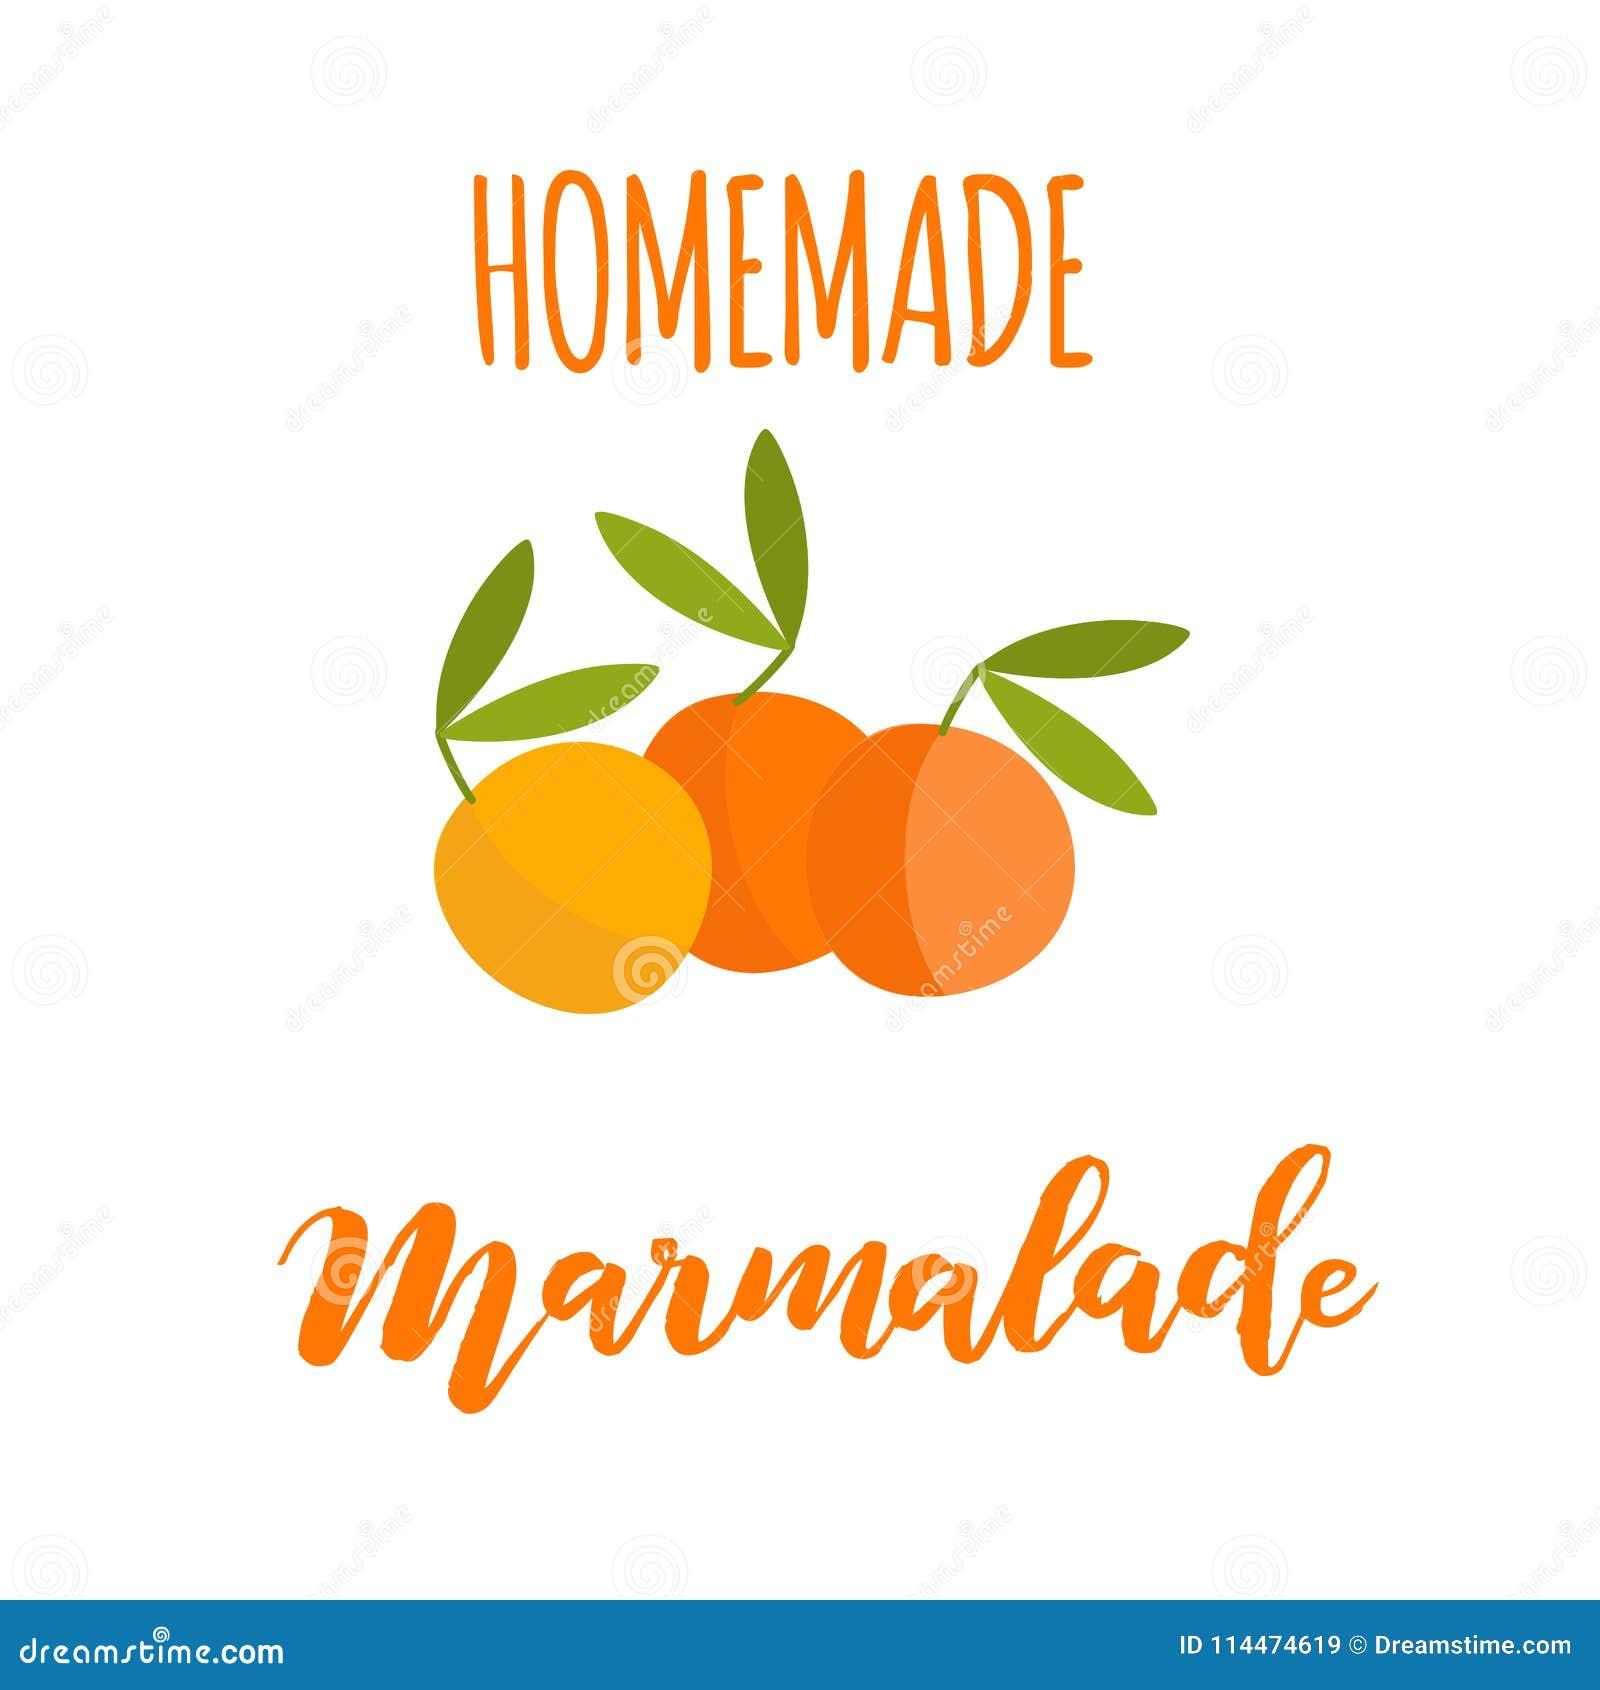 homemade orange marmalade jam label template stock illustration